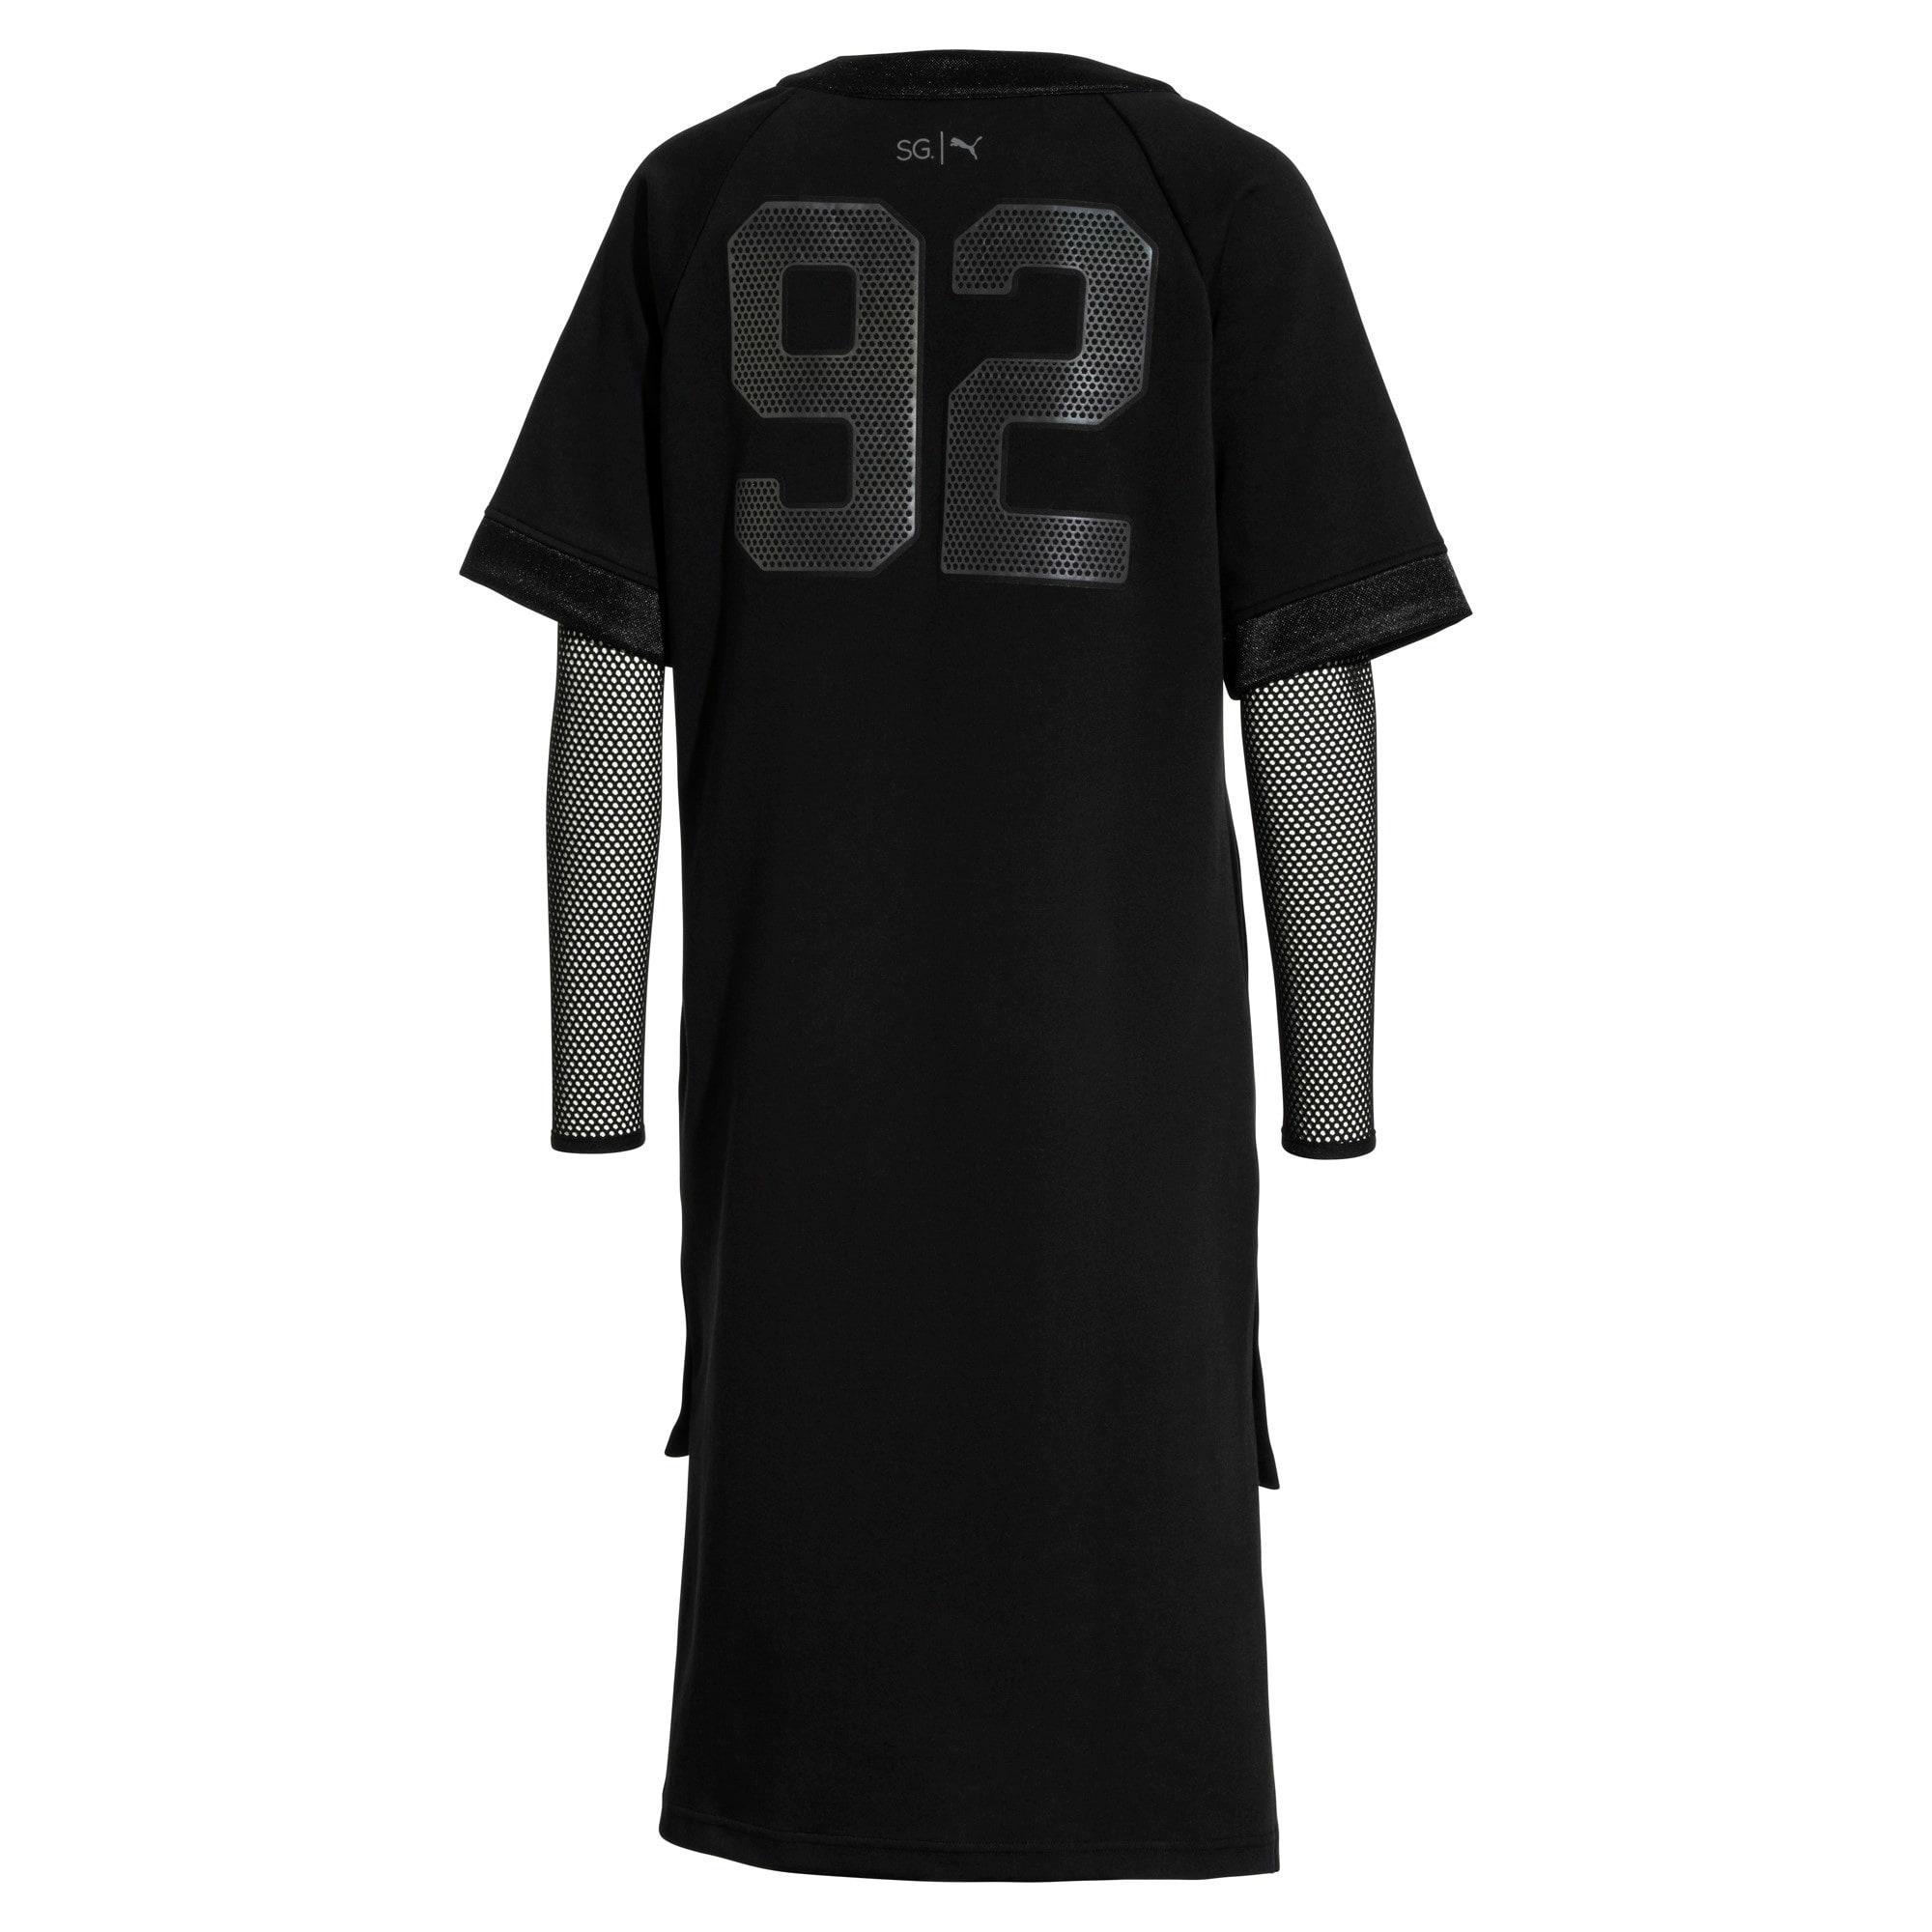 Thumbnail 7 of SG x PUMA Dress, Puma Black, medium